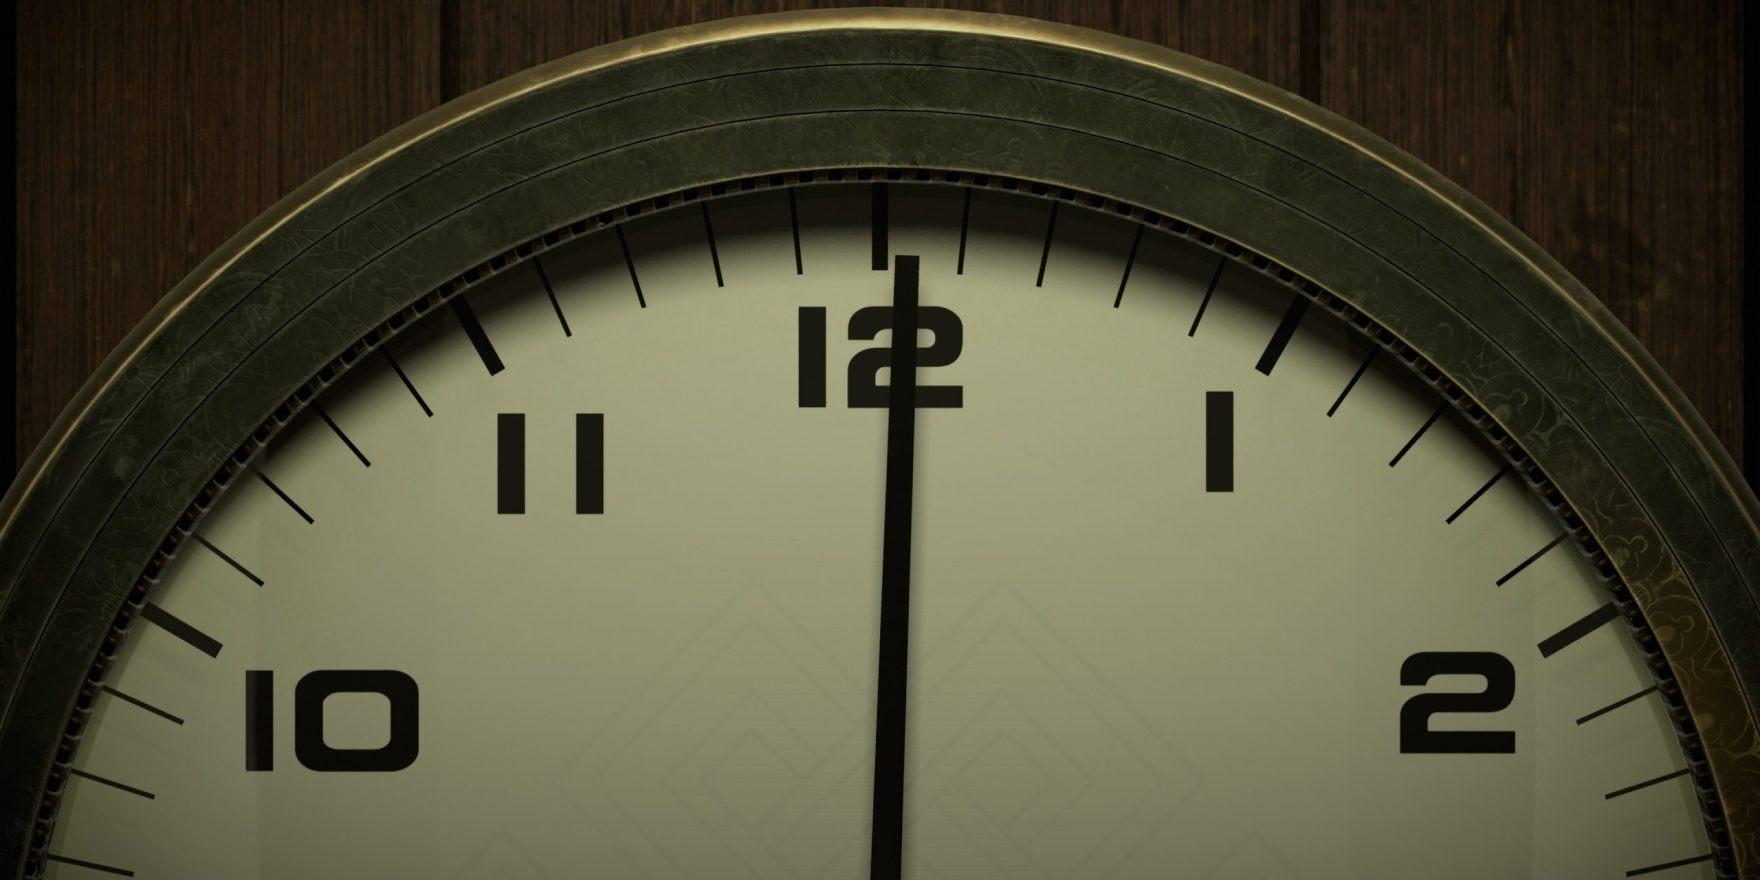 Zwölf Minuten können lang sein